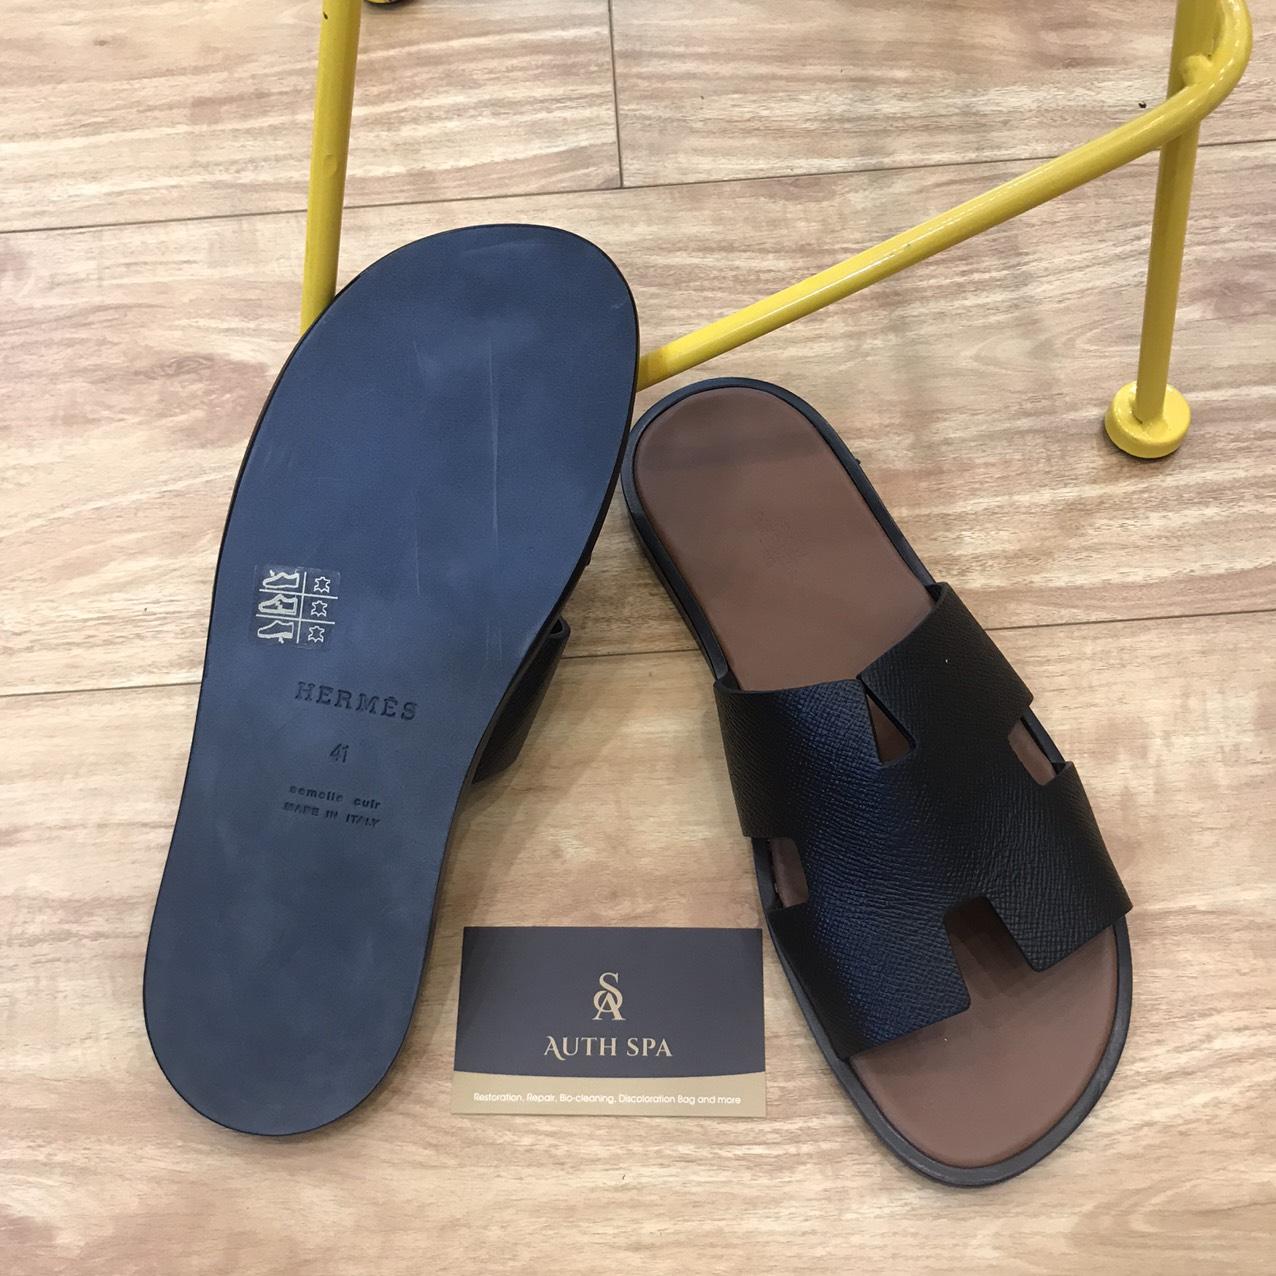 Sửa Chữa Giày Dép Gucci, Chanel, Louis Vuitton, Hermes ... 8